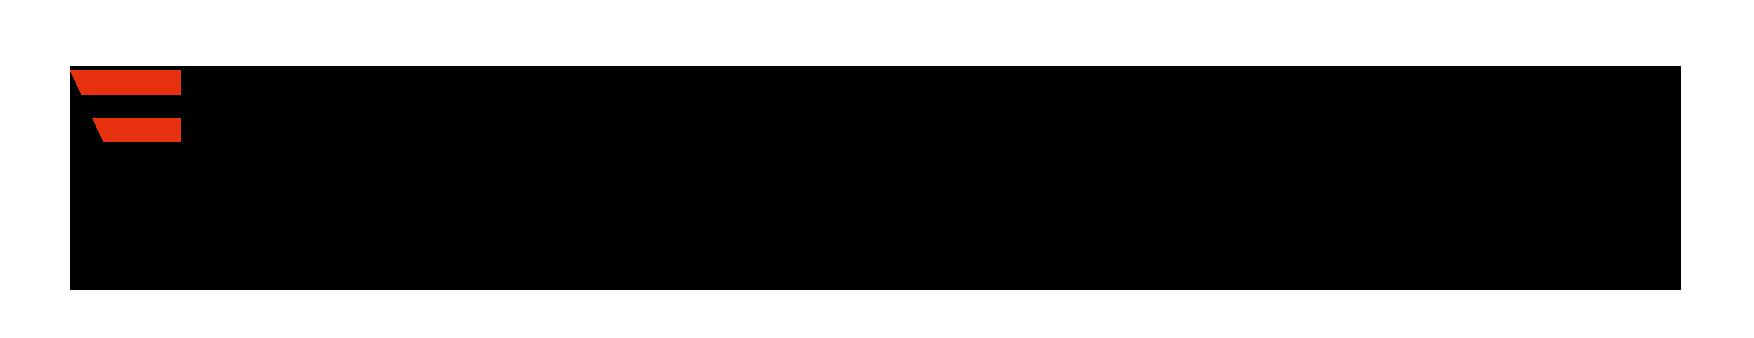 BMOEDS_Logo_srgb